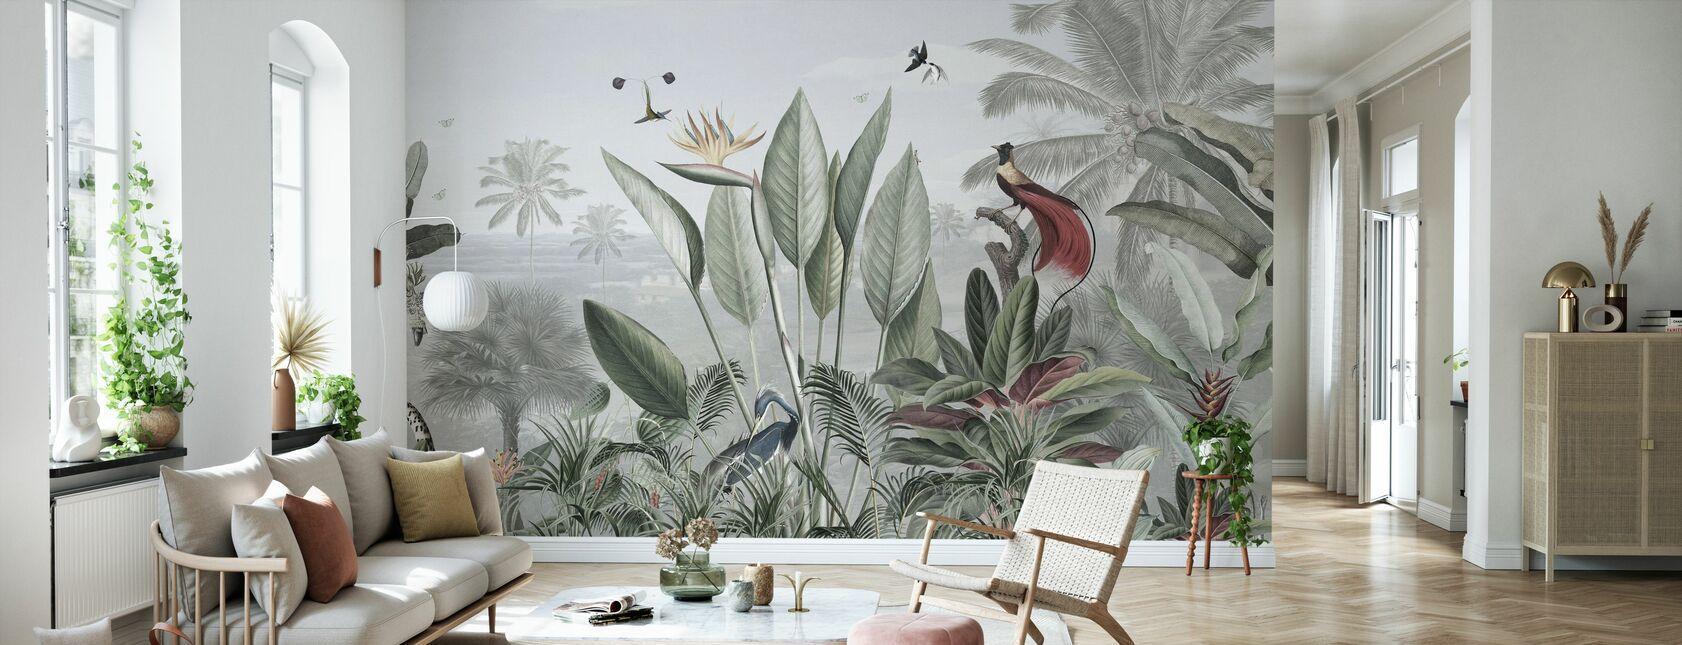 Bellezza Botanica - Panorama - Carta da parati - Salotto